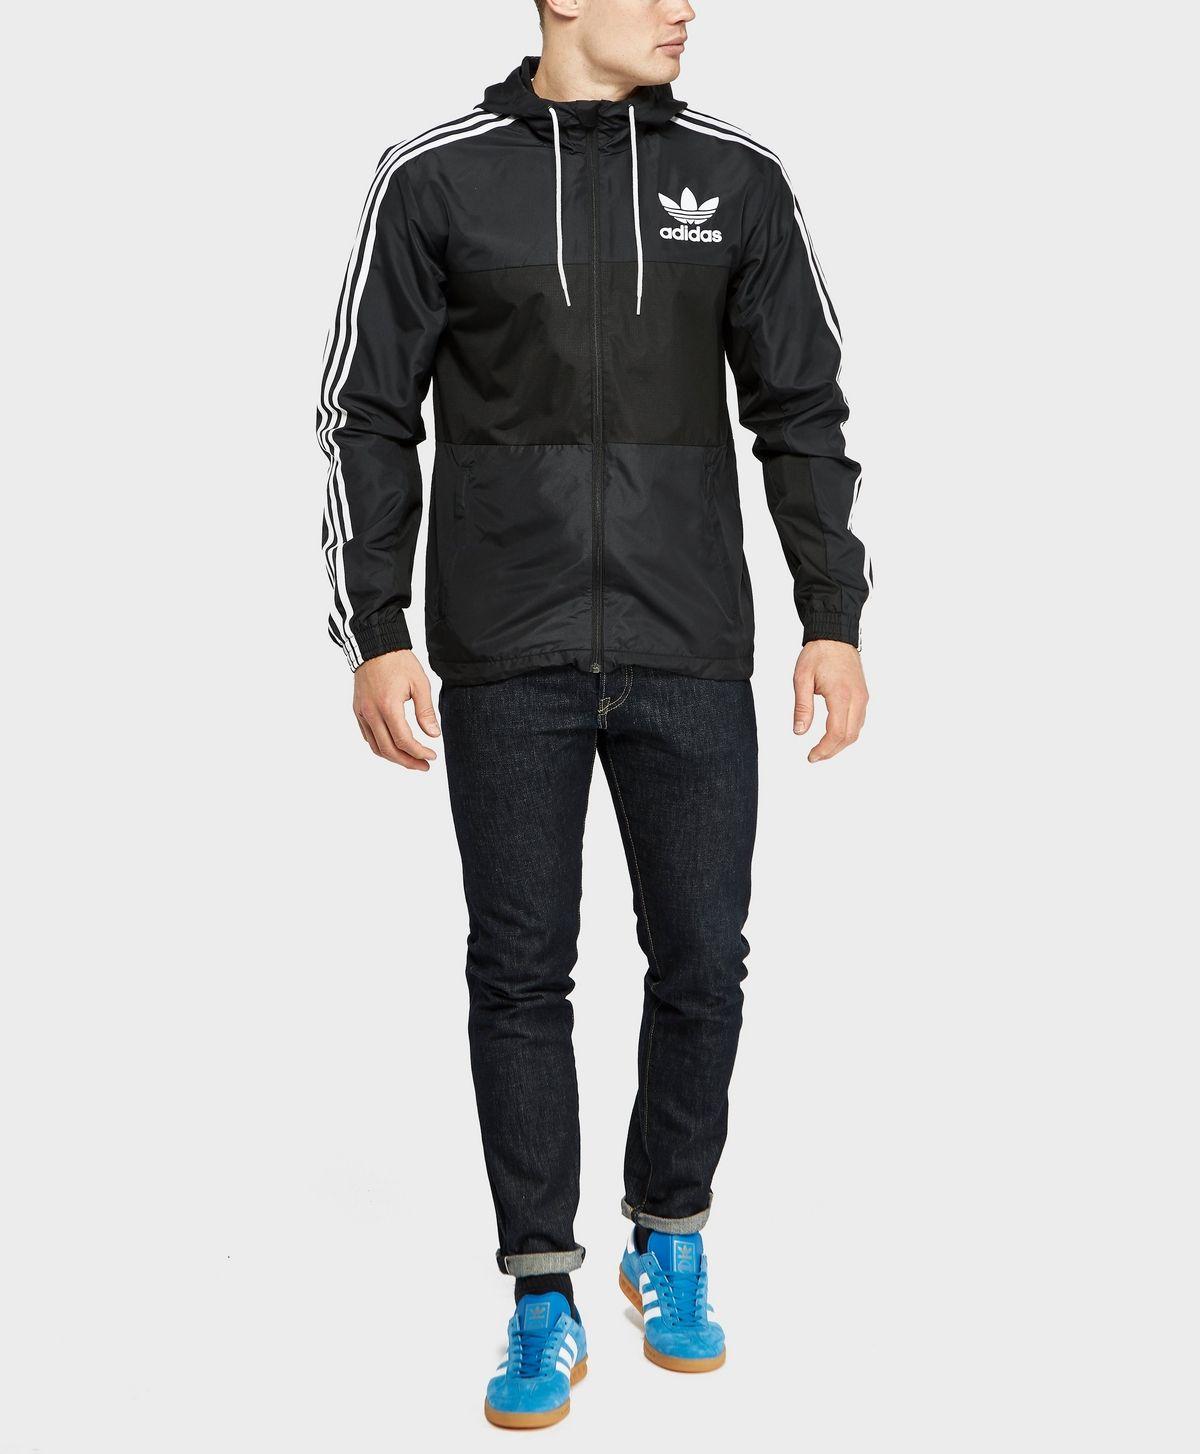 Adidas Originals California windbreaker ligero chaqueta adidas